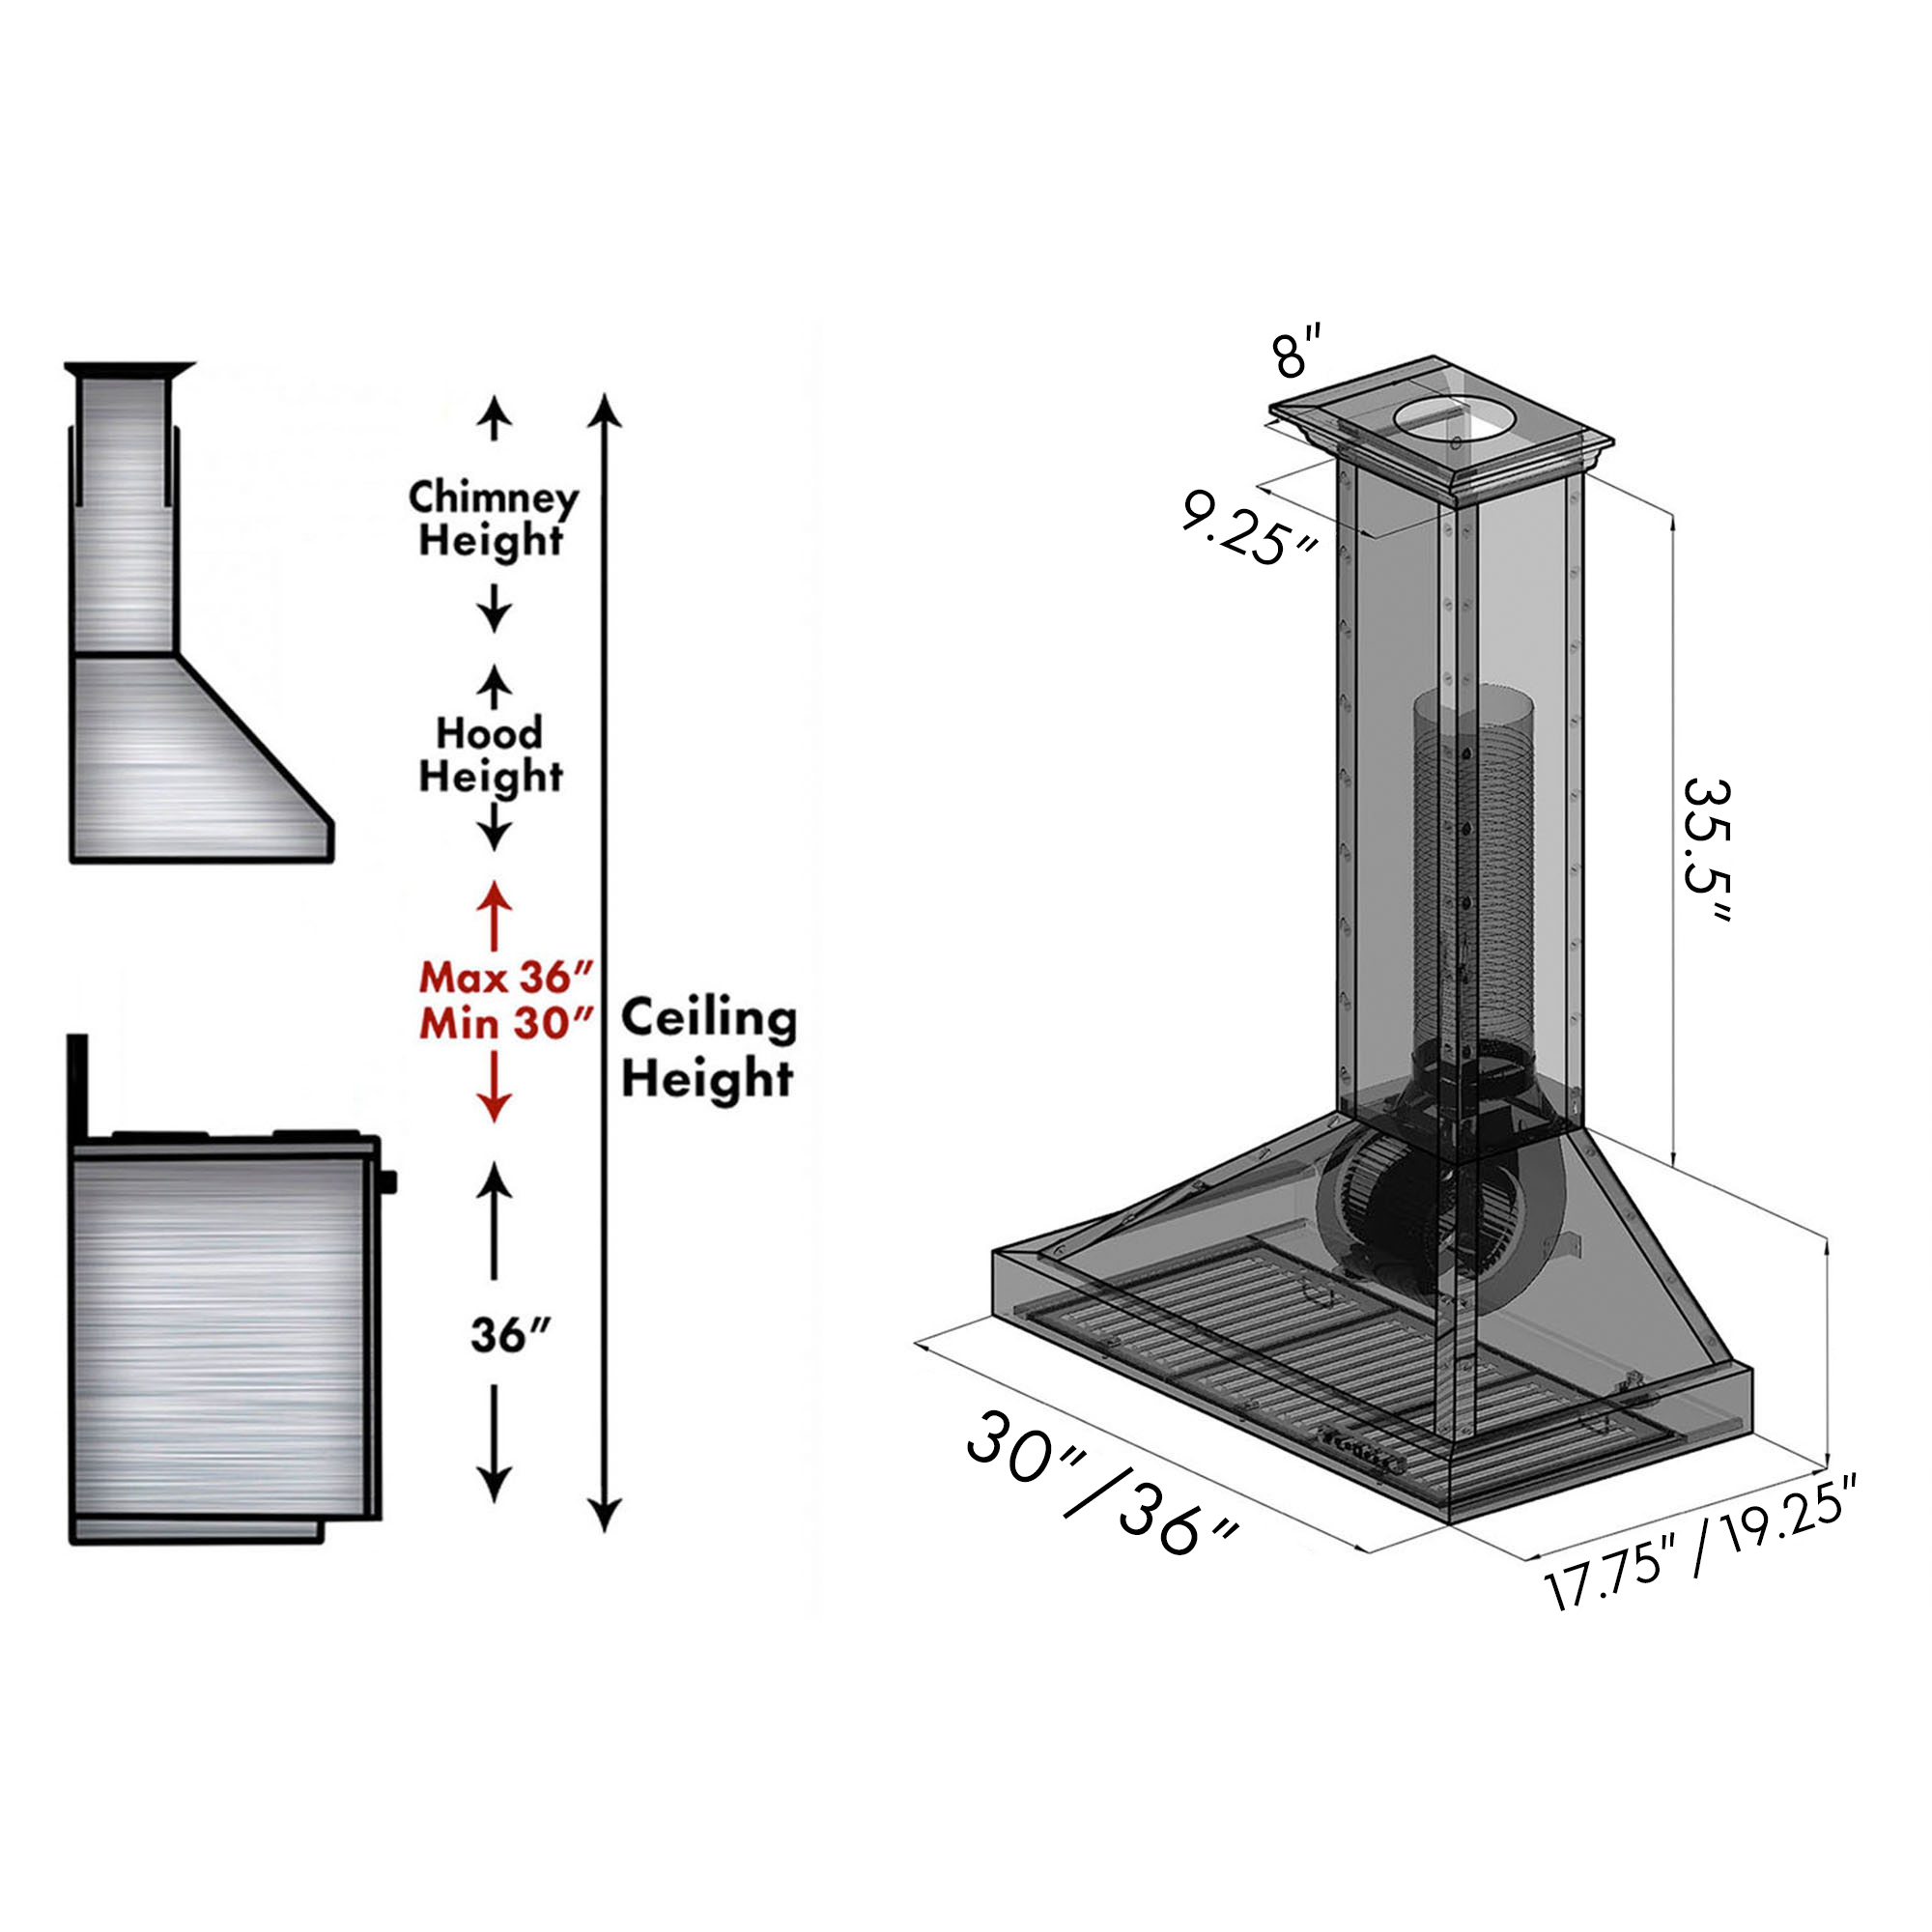 zline-copper-wall-mounted-range-hood-KB2-graphic copy.jpg